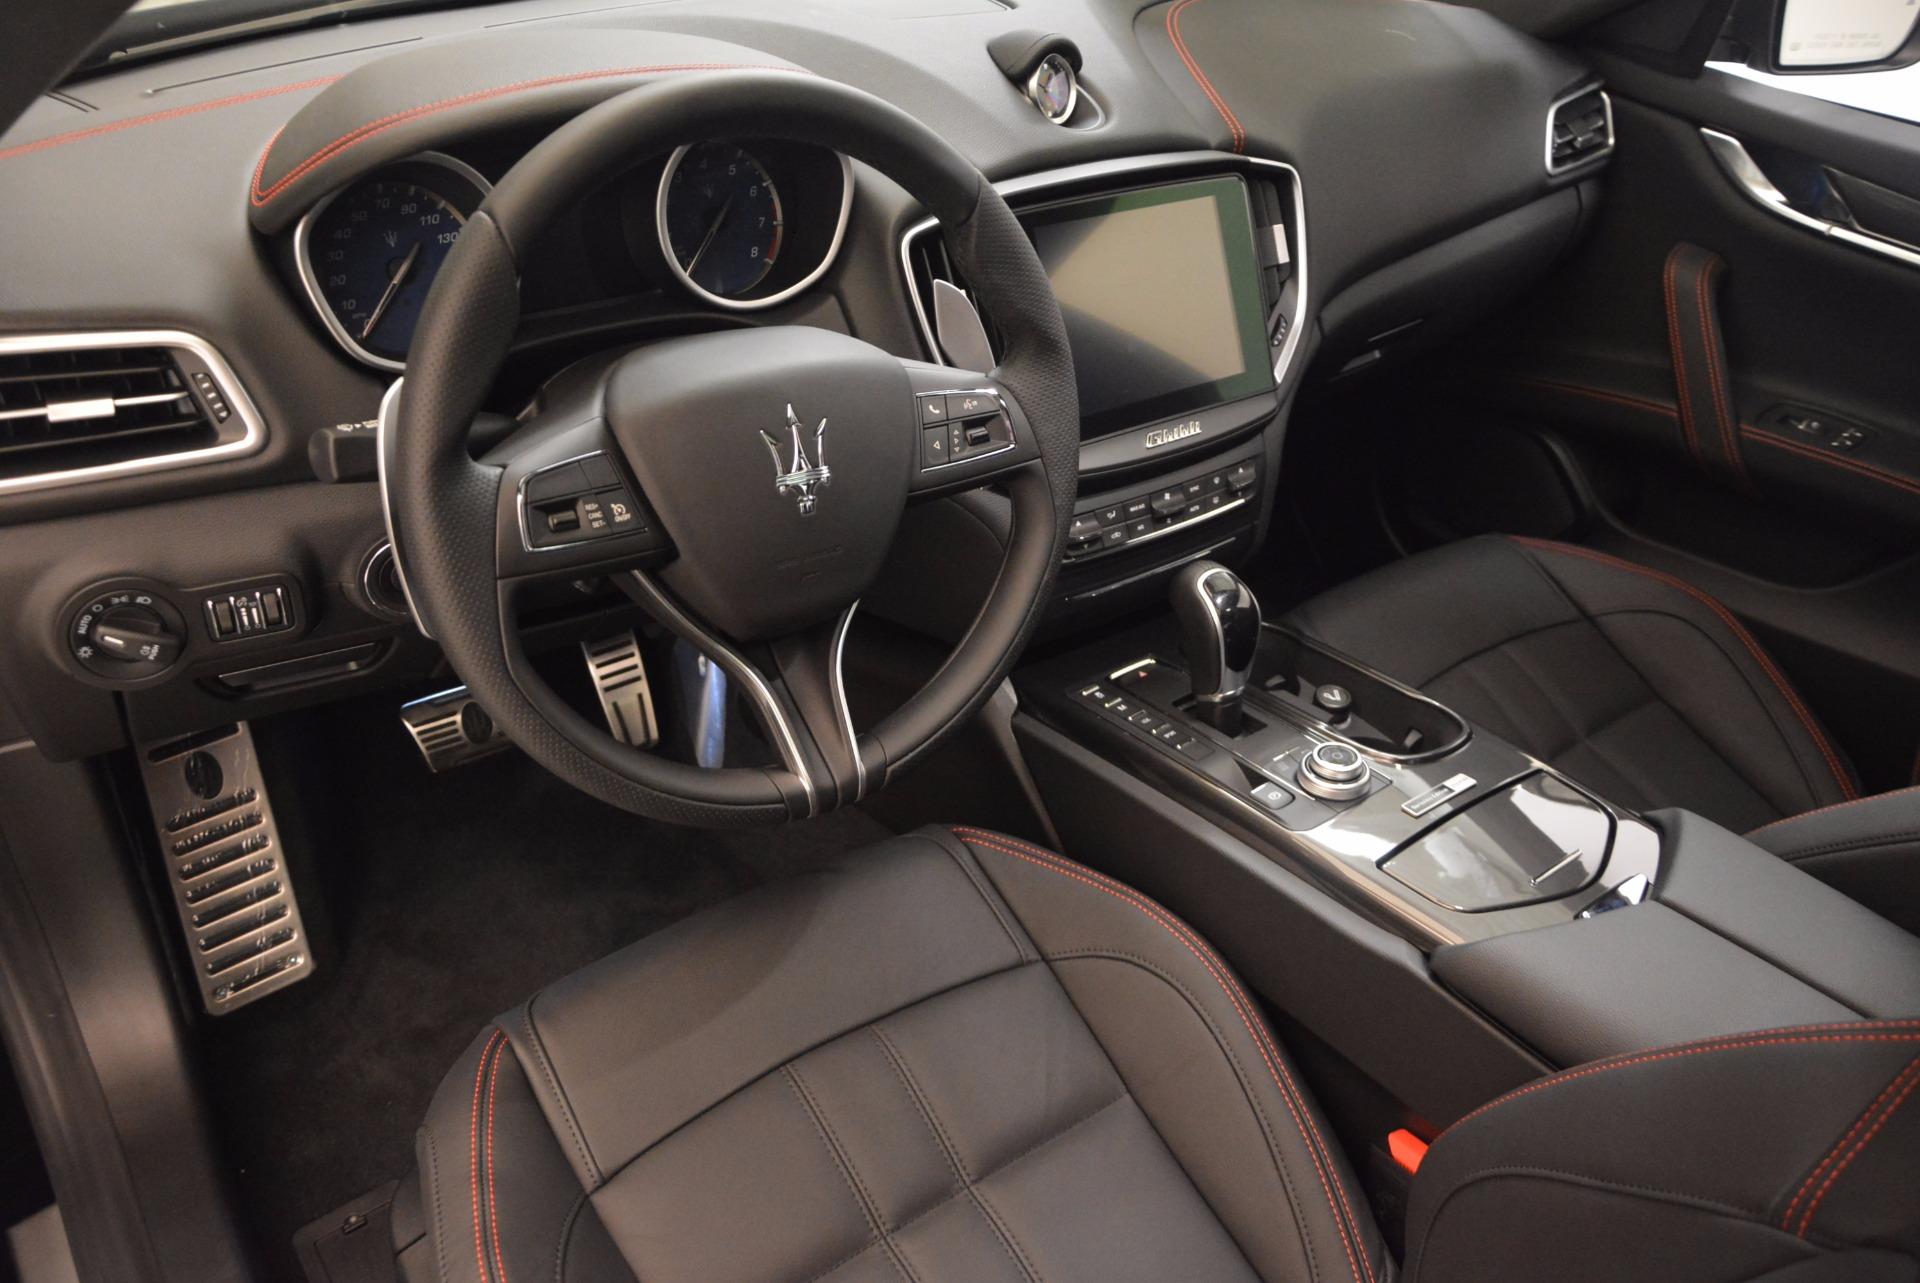 New 2017 Maserati Ghibli SQ4 S Q4 Nerissimo Edition For Sale In Westport, CT 1334_p13